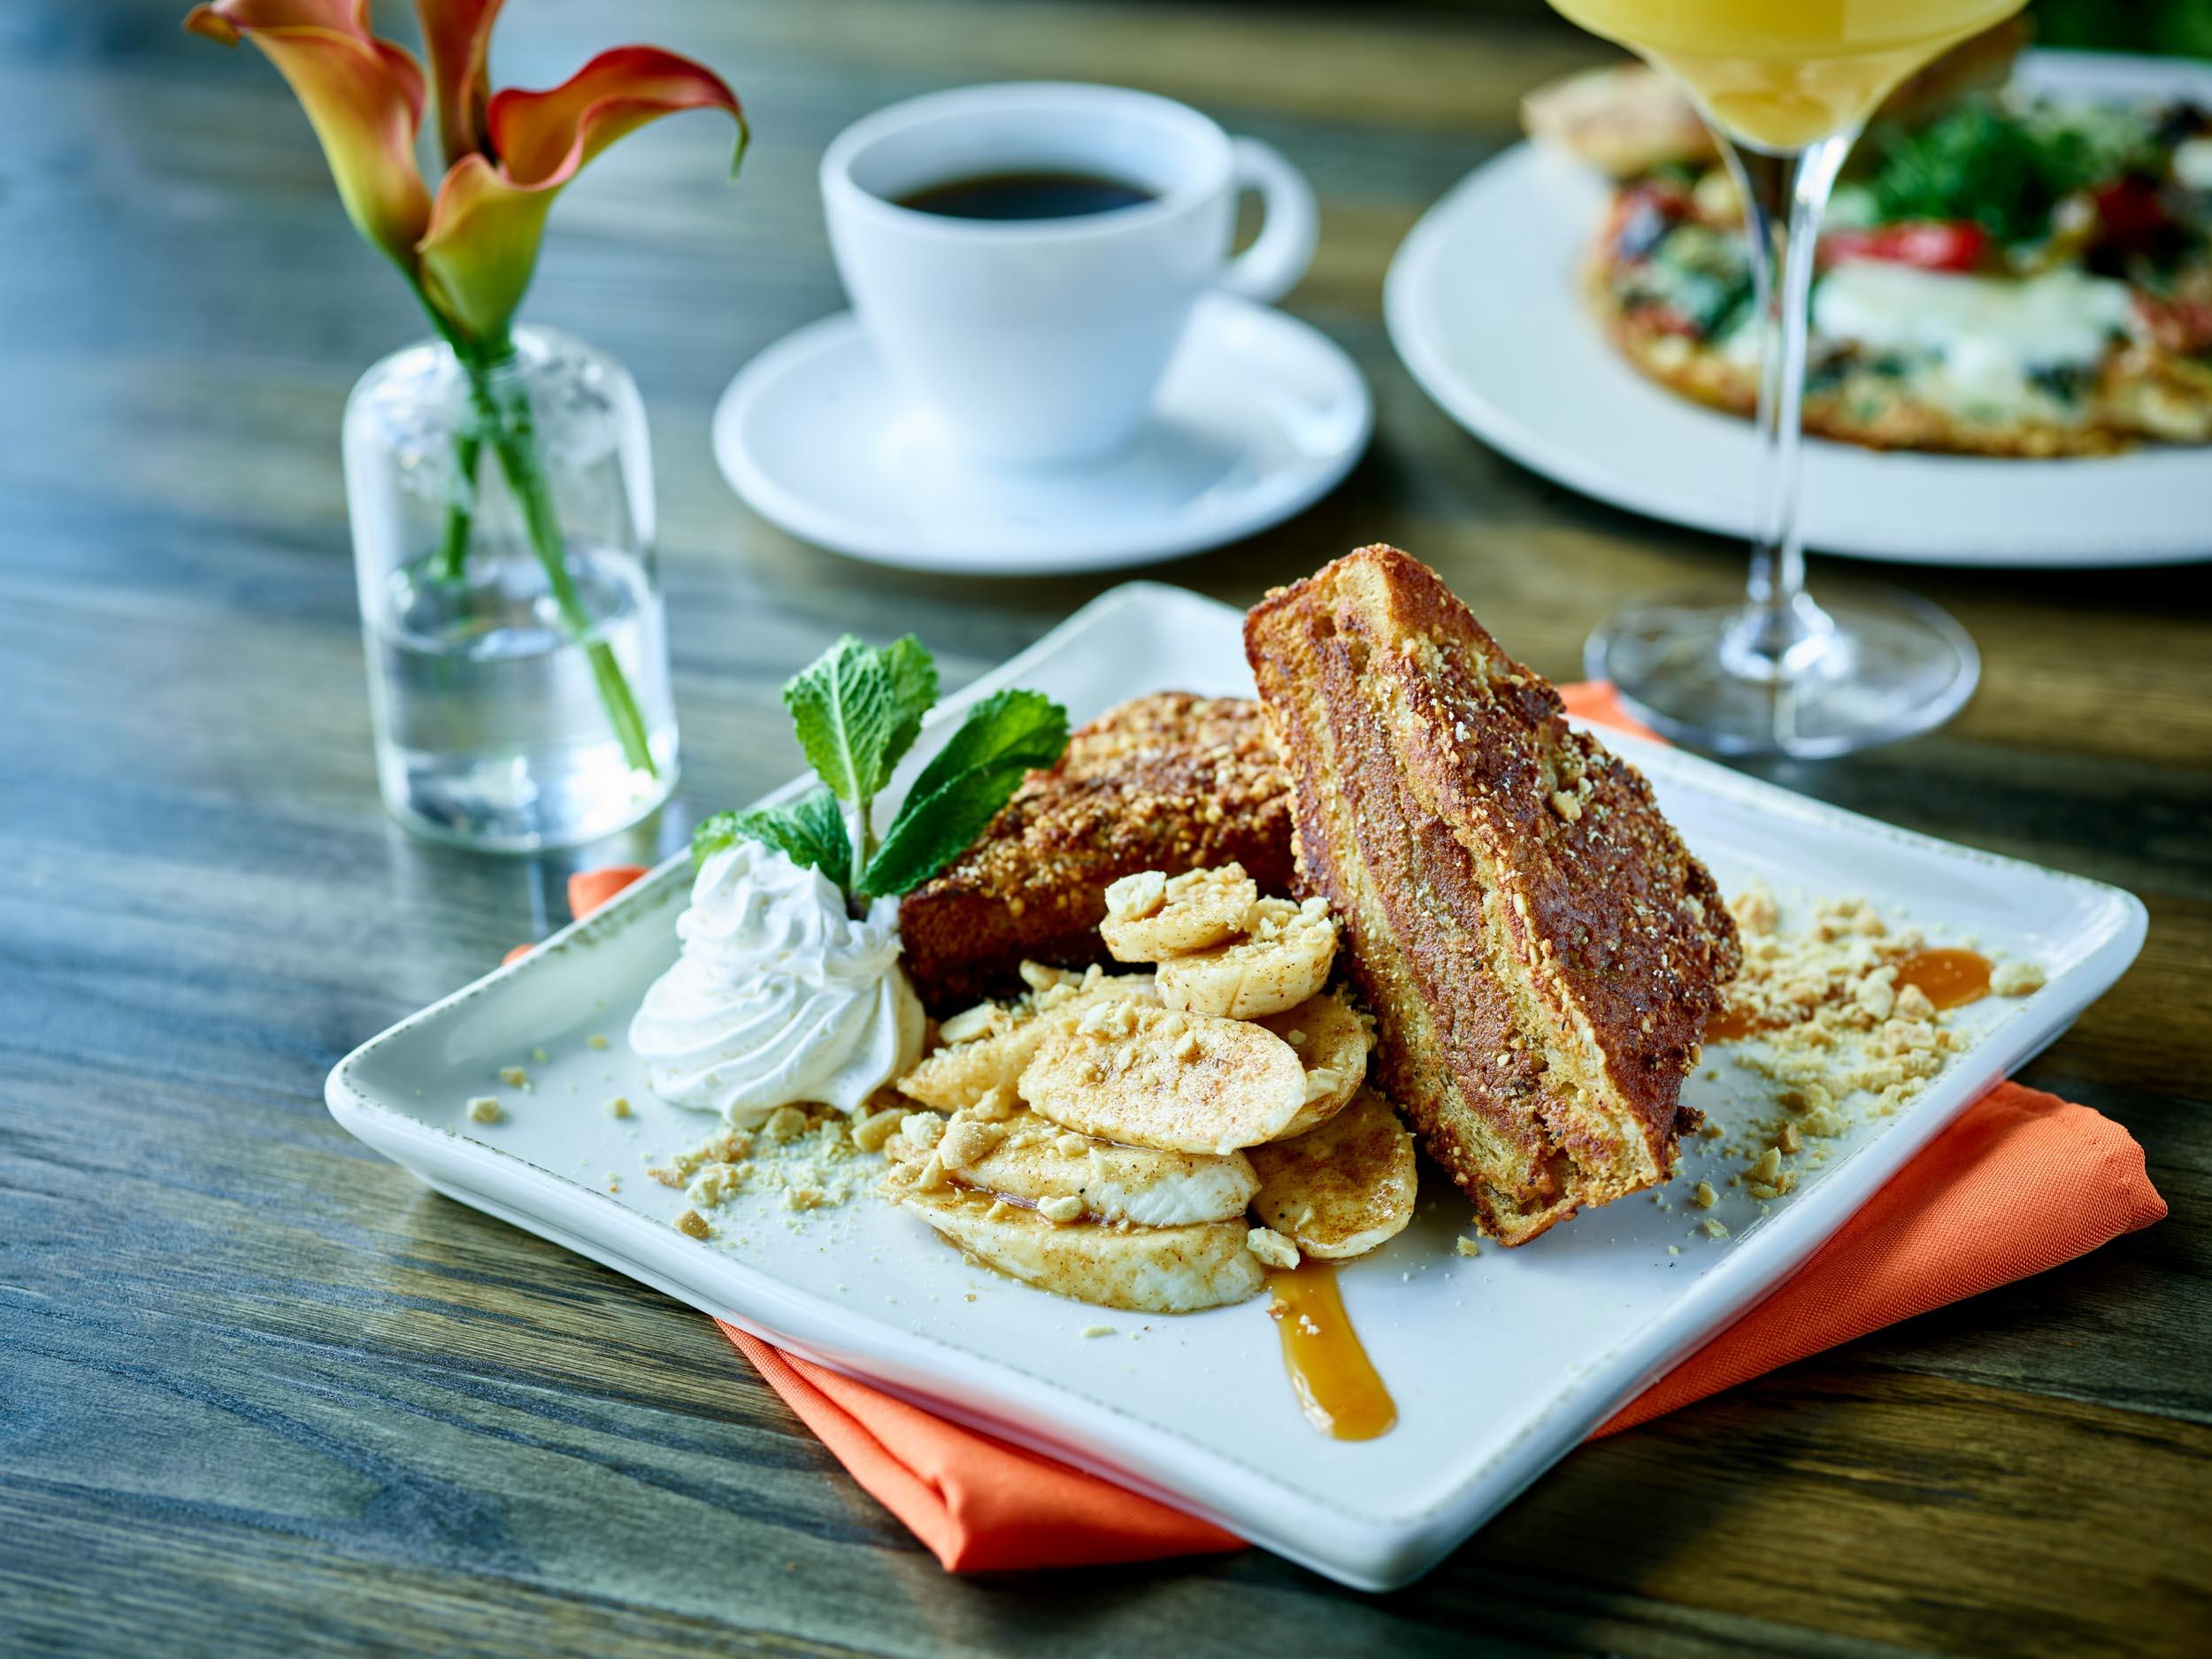 BRI-vivians-breakfast-food-181101-17829-LR.jpg